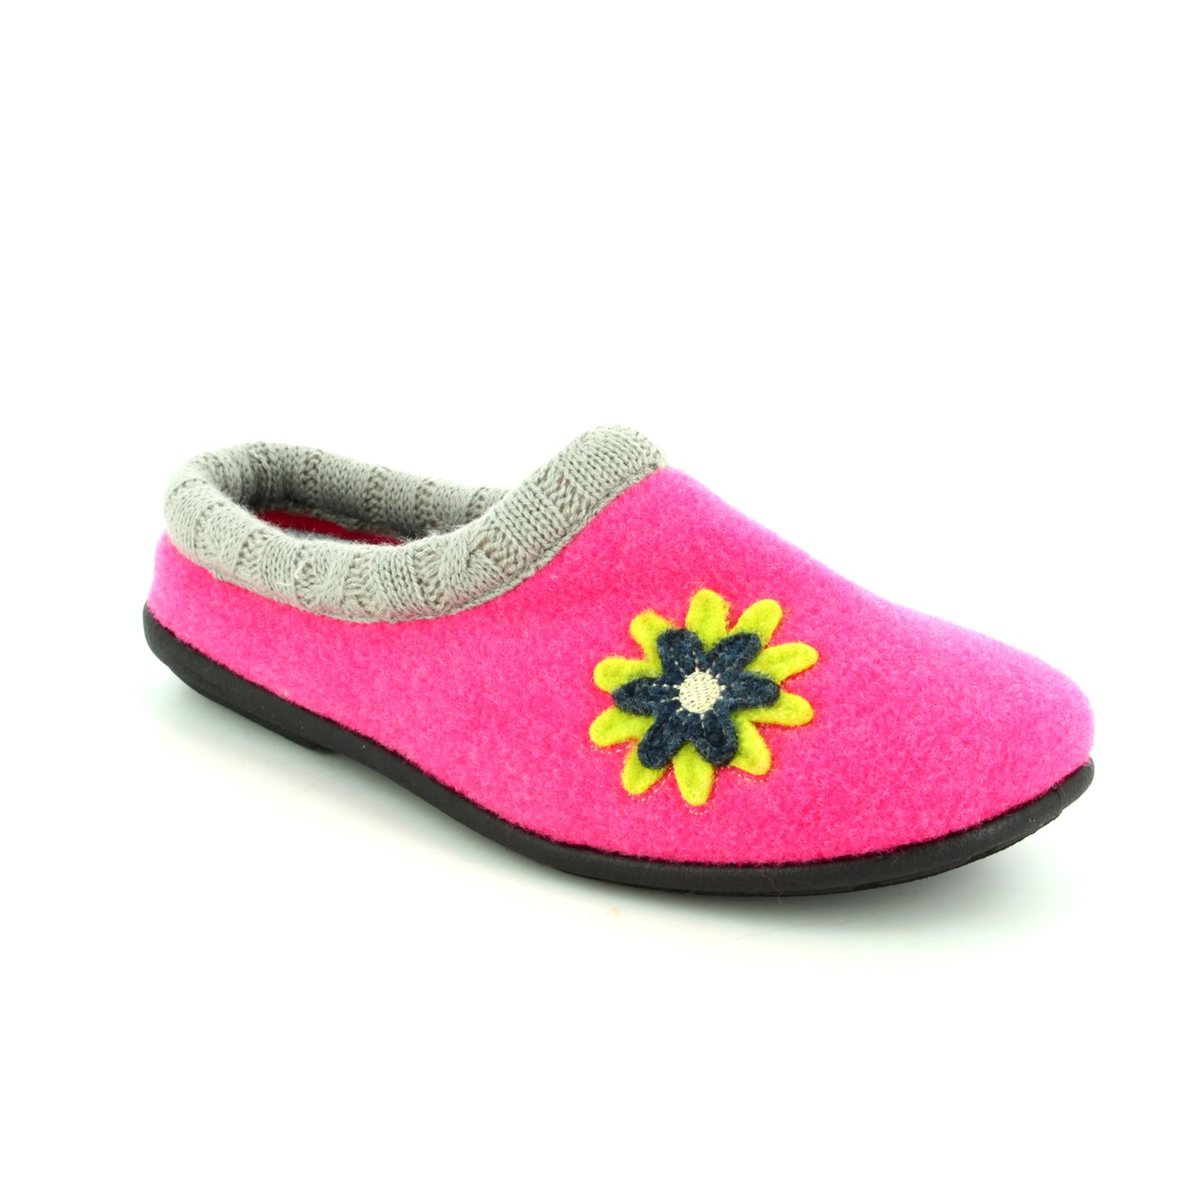 78aba9a1a9c Padders Slippers - Pink multi - 4018 53 FREESIA 2E-3E FIT